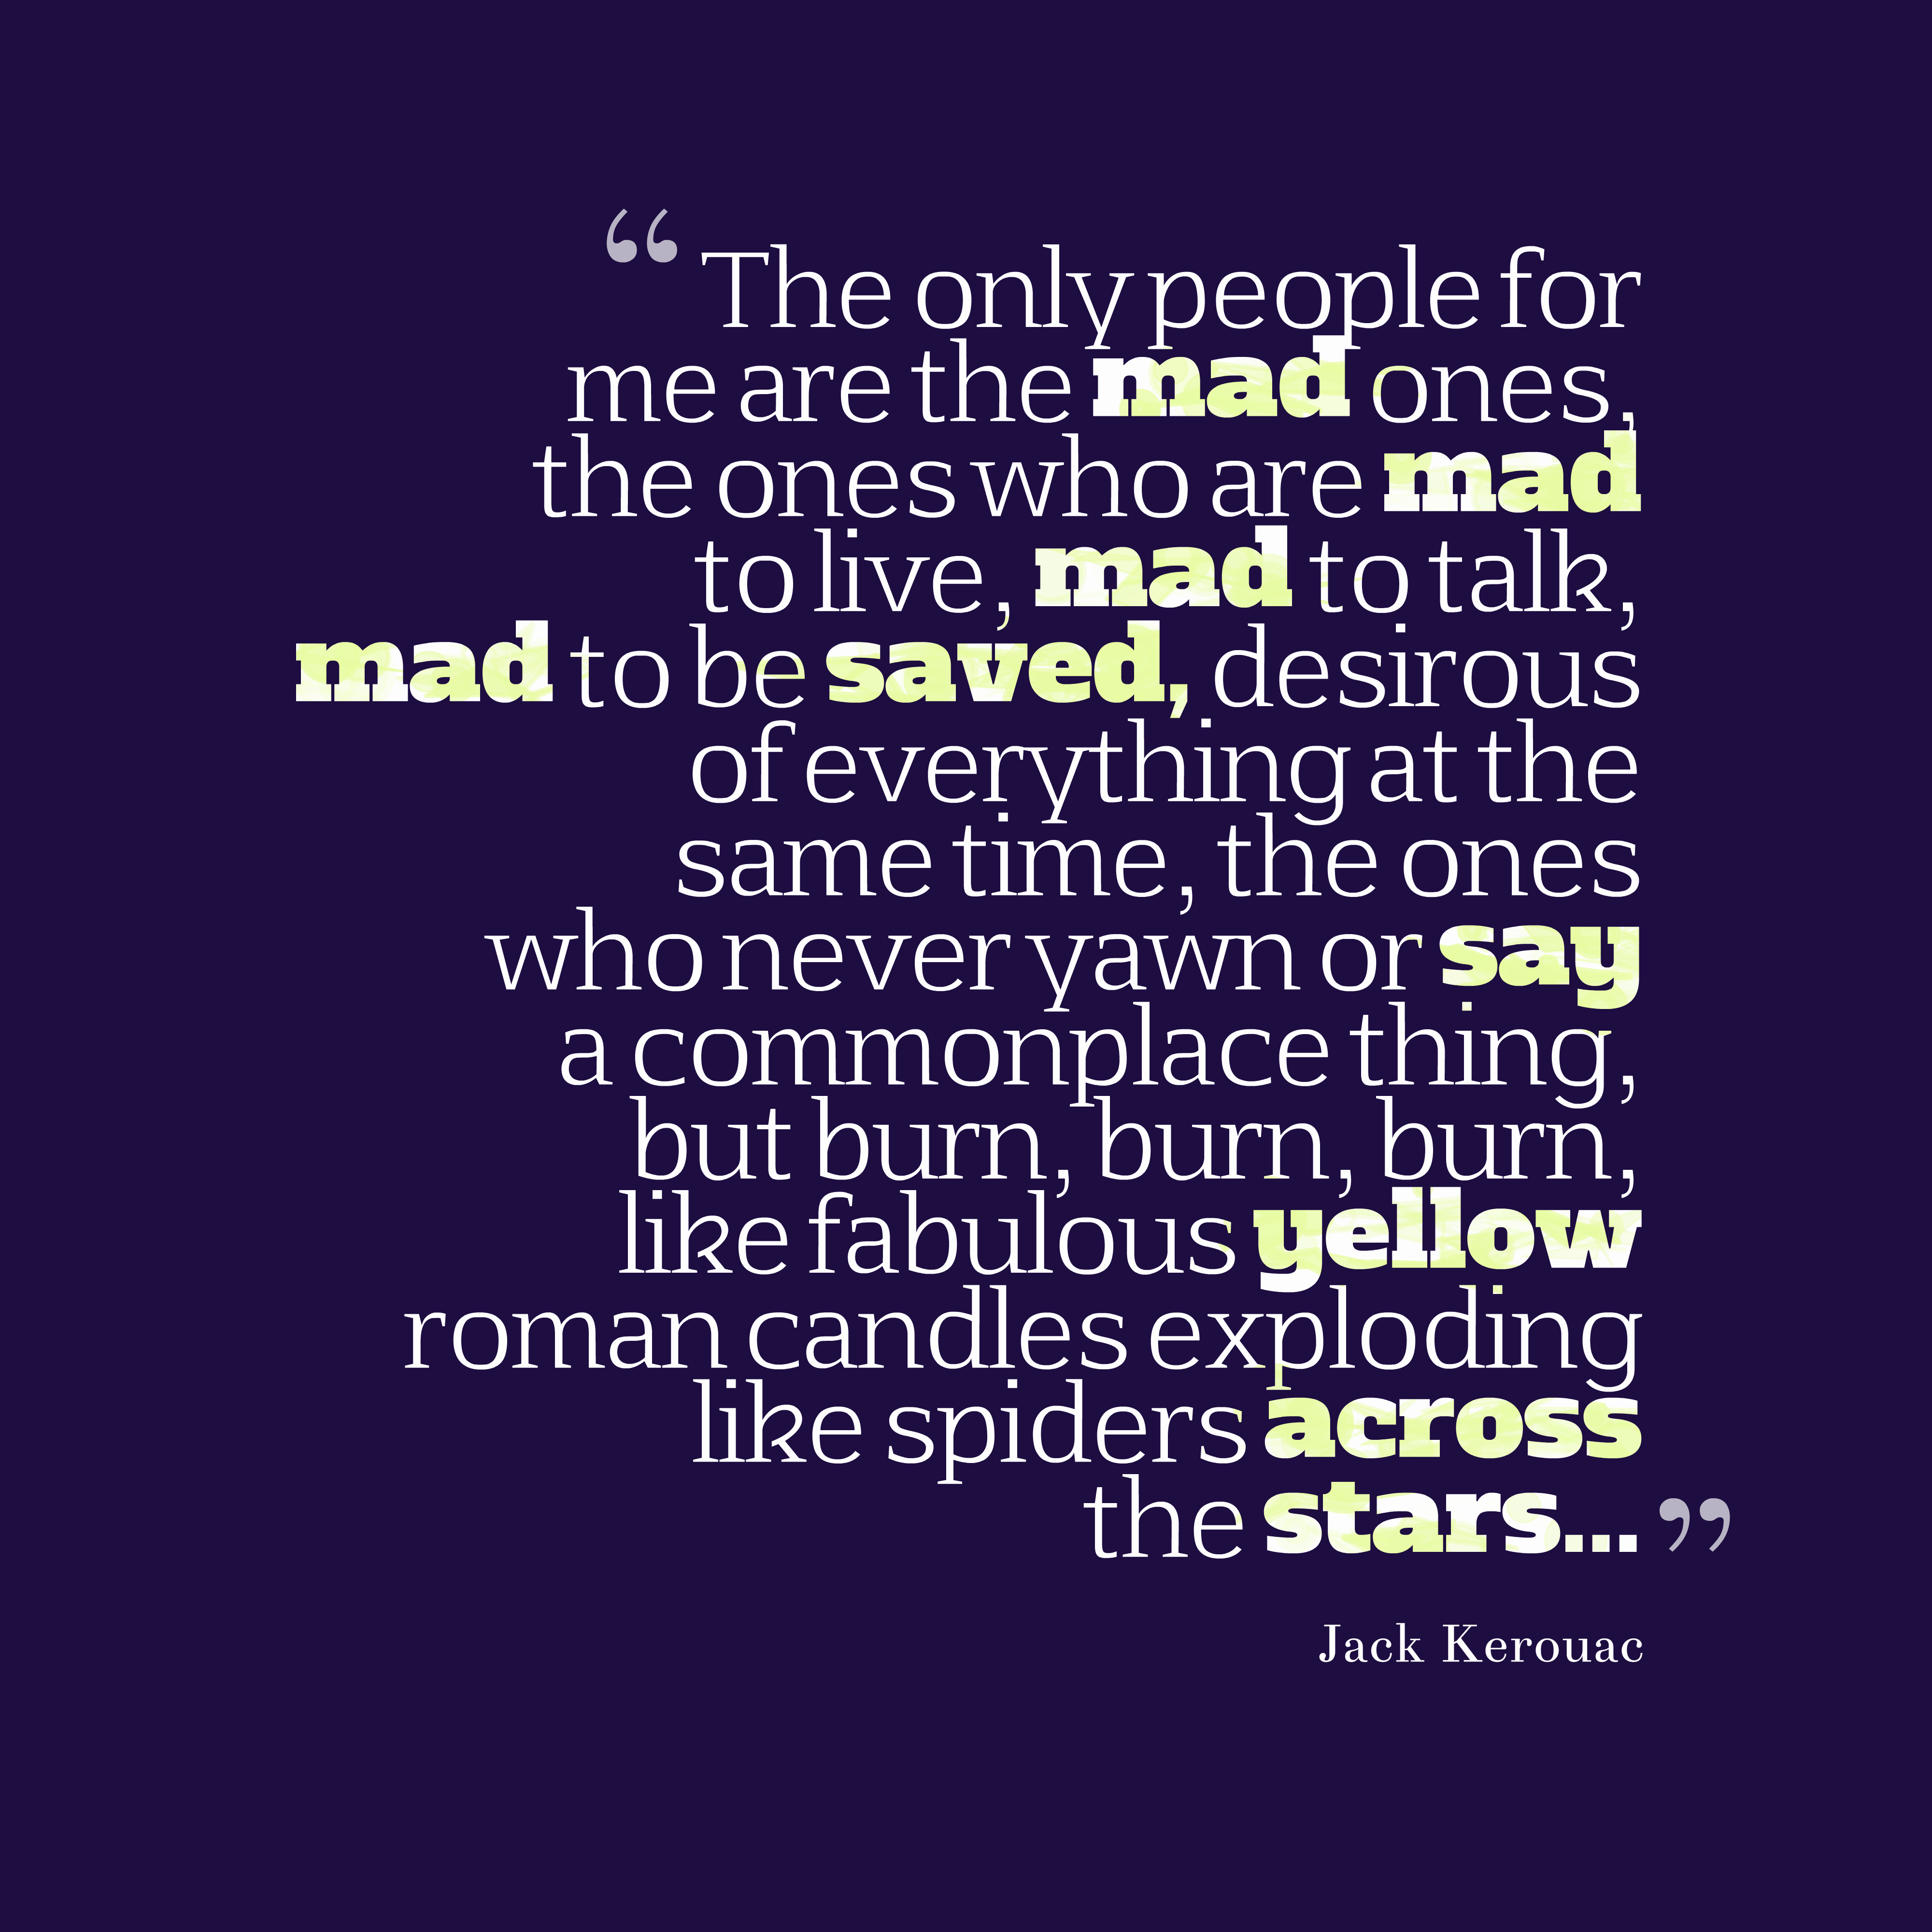 Jack Kerouac quote about passion.